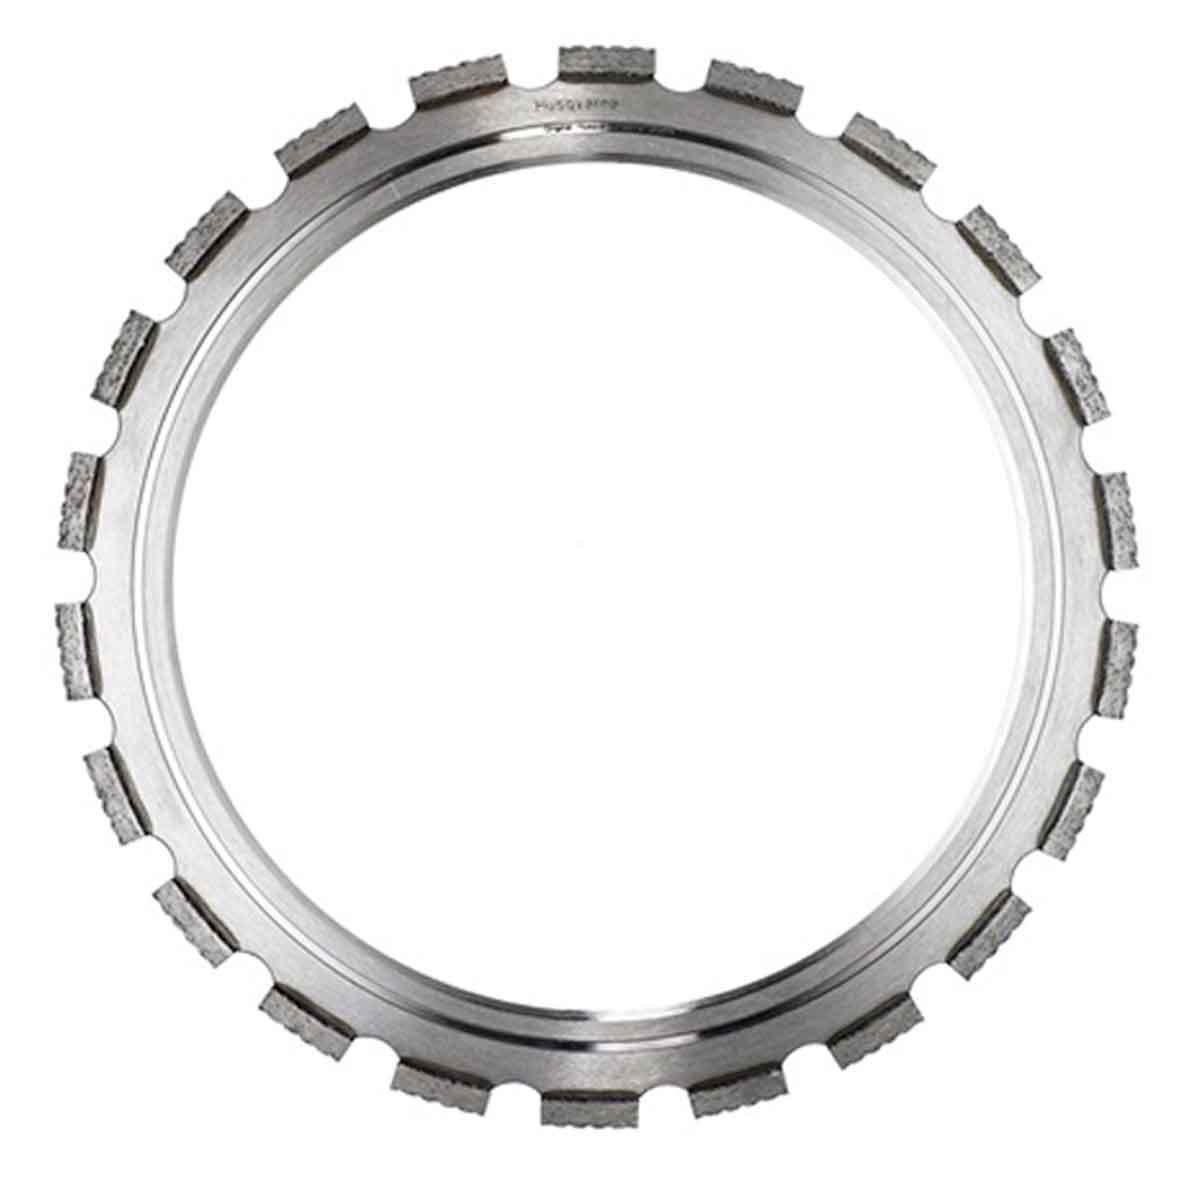 Husqvarna R1420 14 inch Diagrip Ring Saw Blade